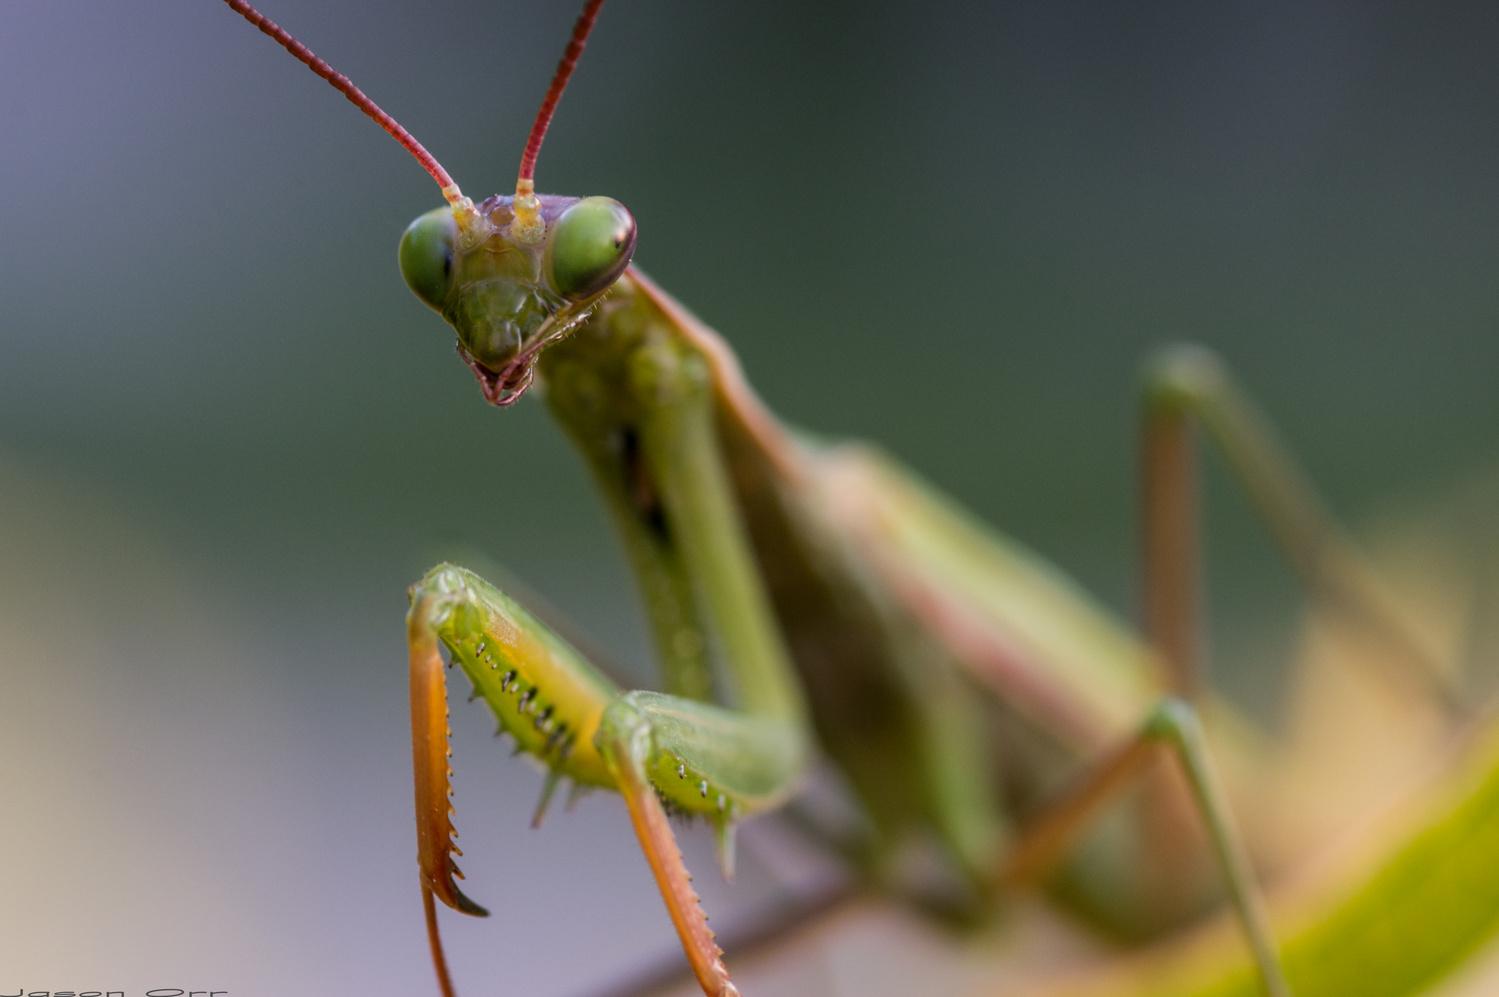 Mantis by Jason Orr